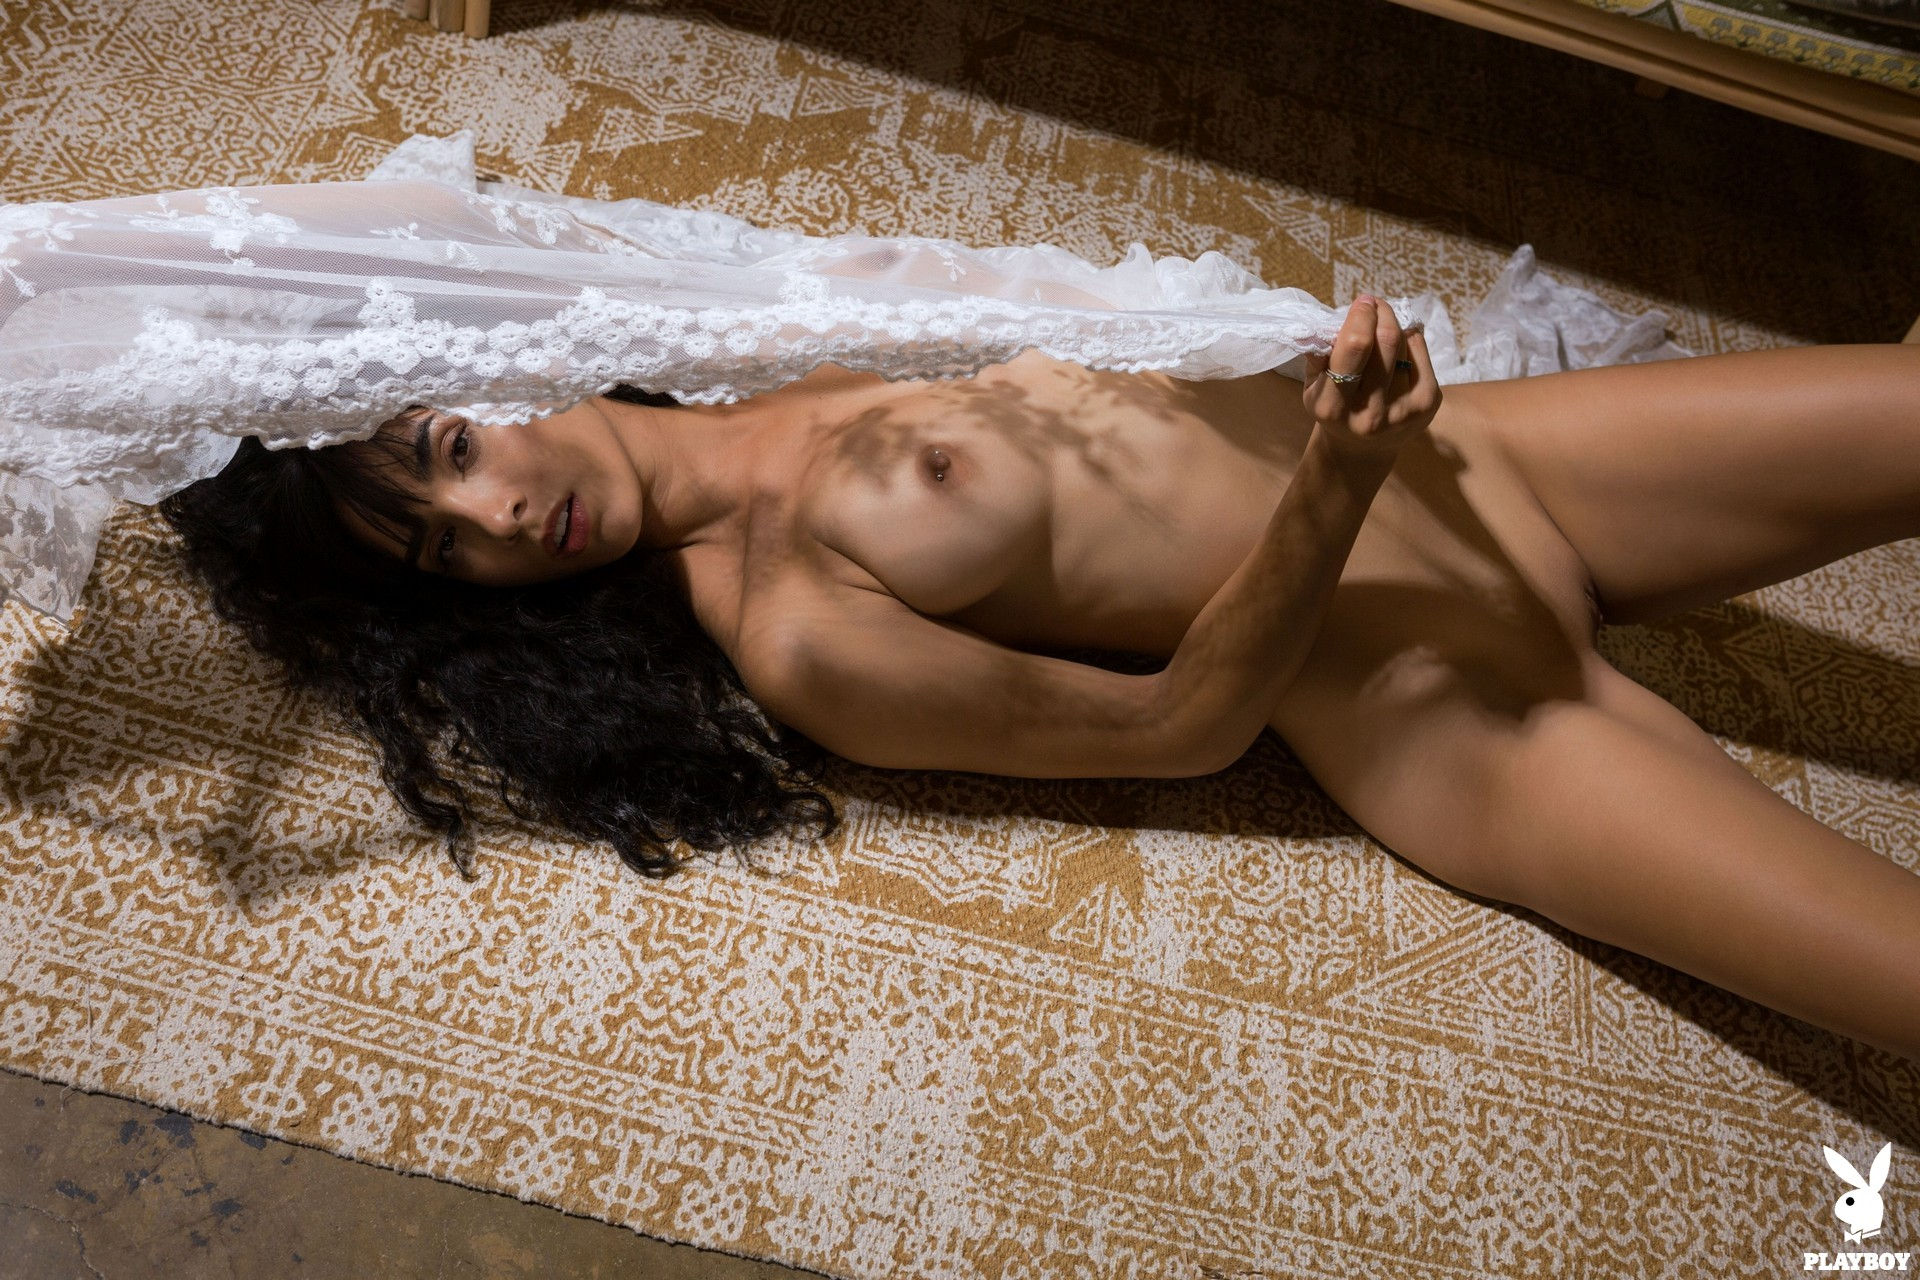 Erika De Leija in Perfect Daydream - Playboy Plus 35